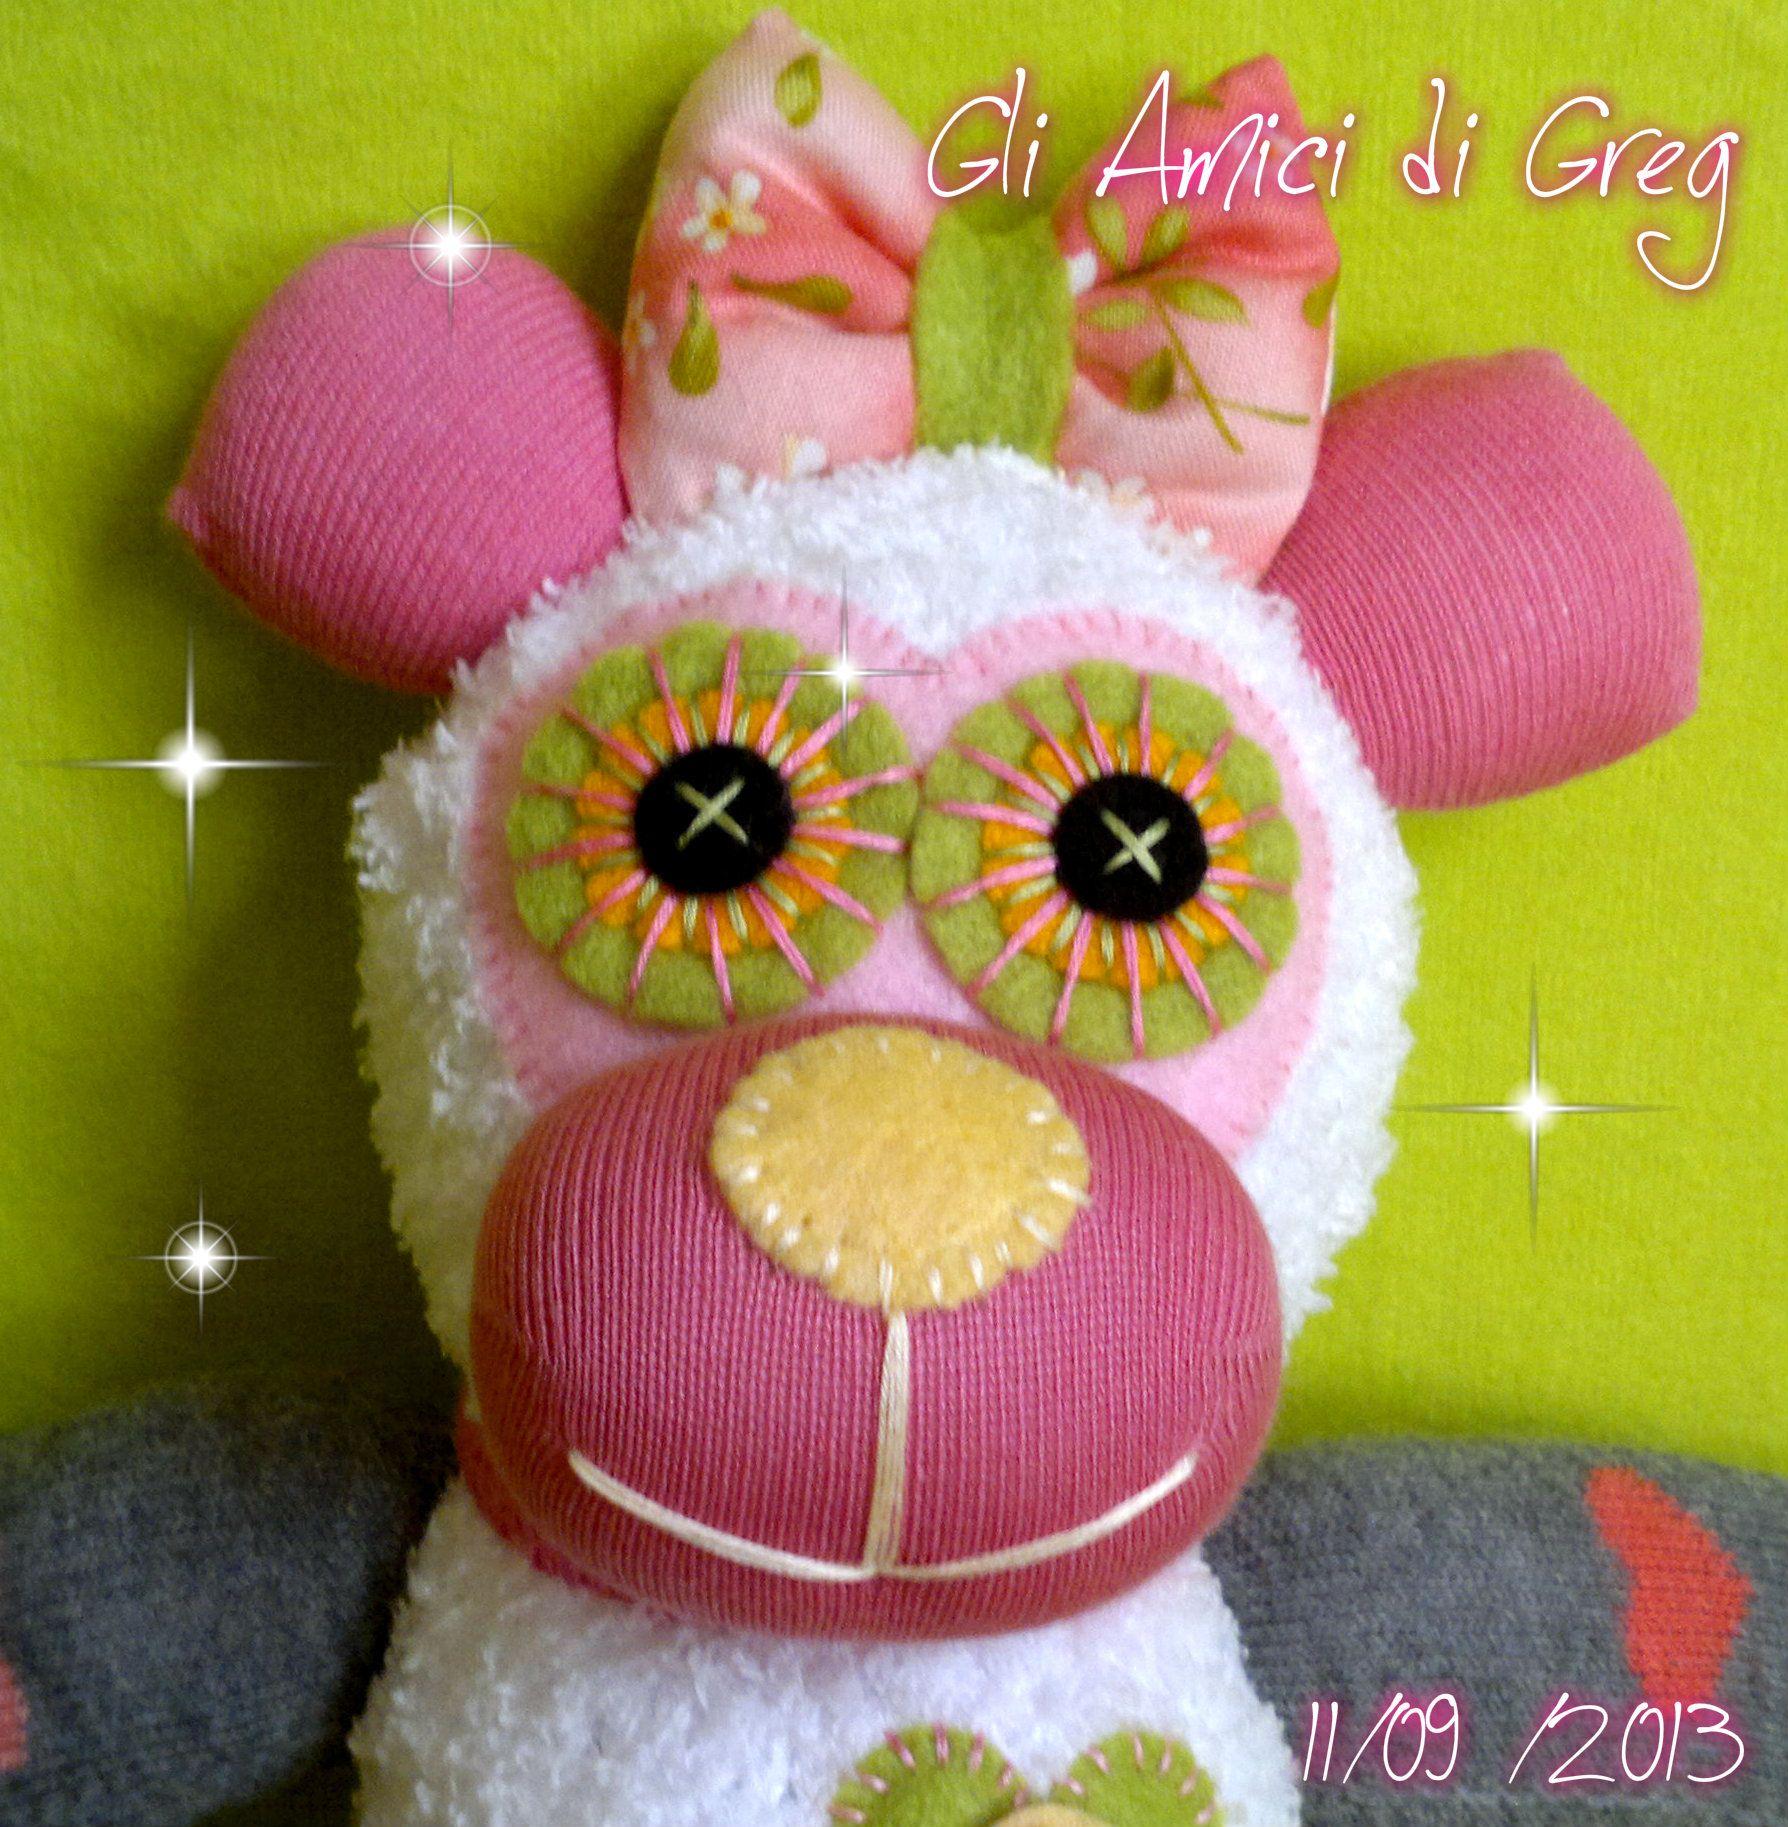 Pupazzetta pecorella :-)